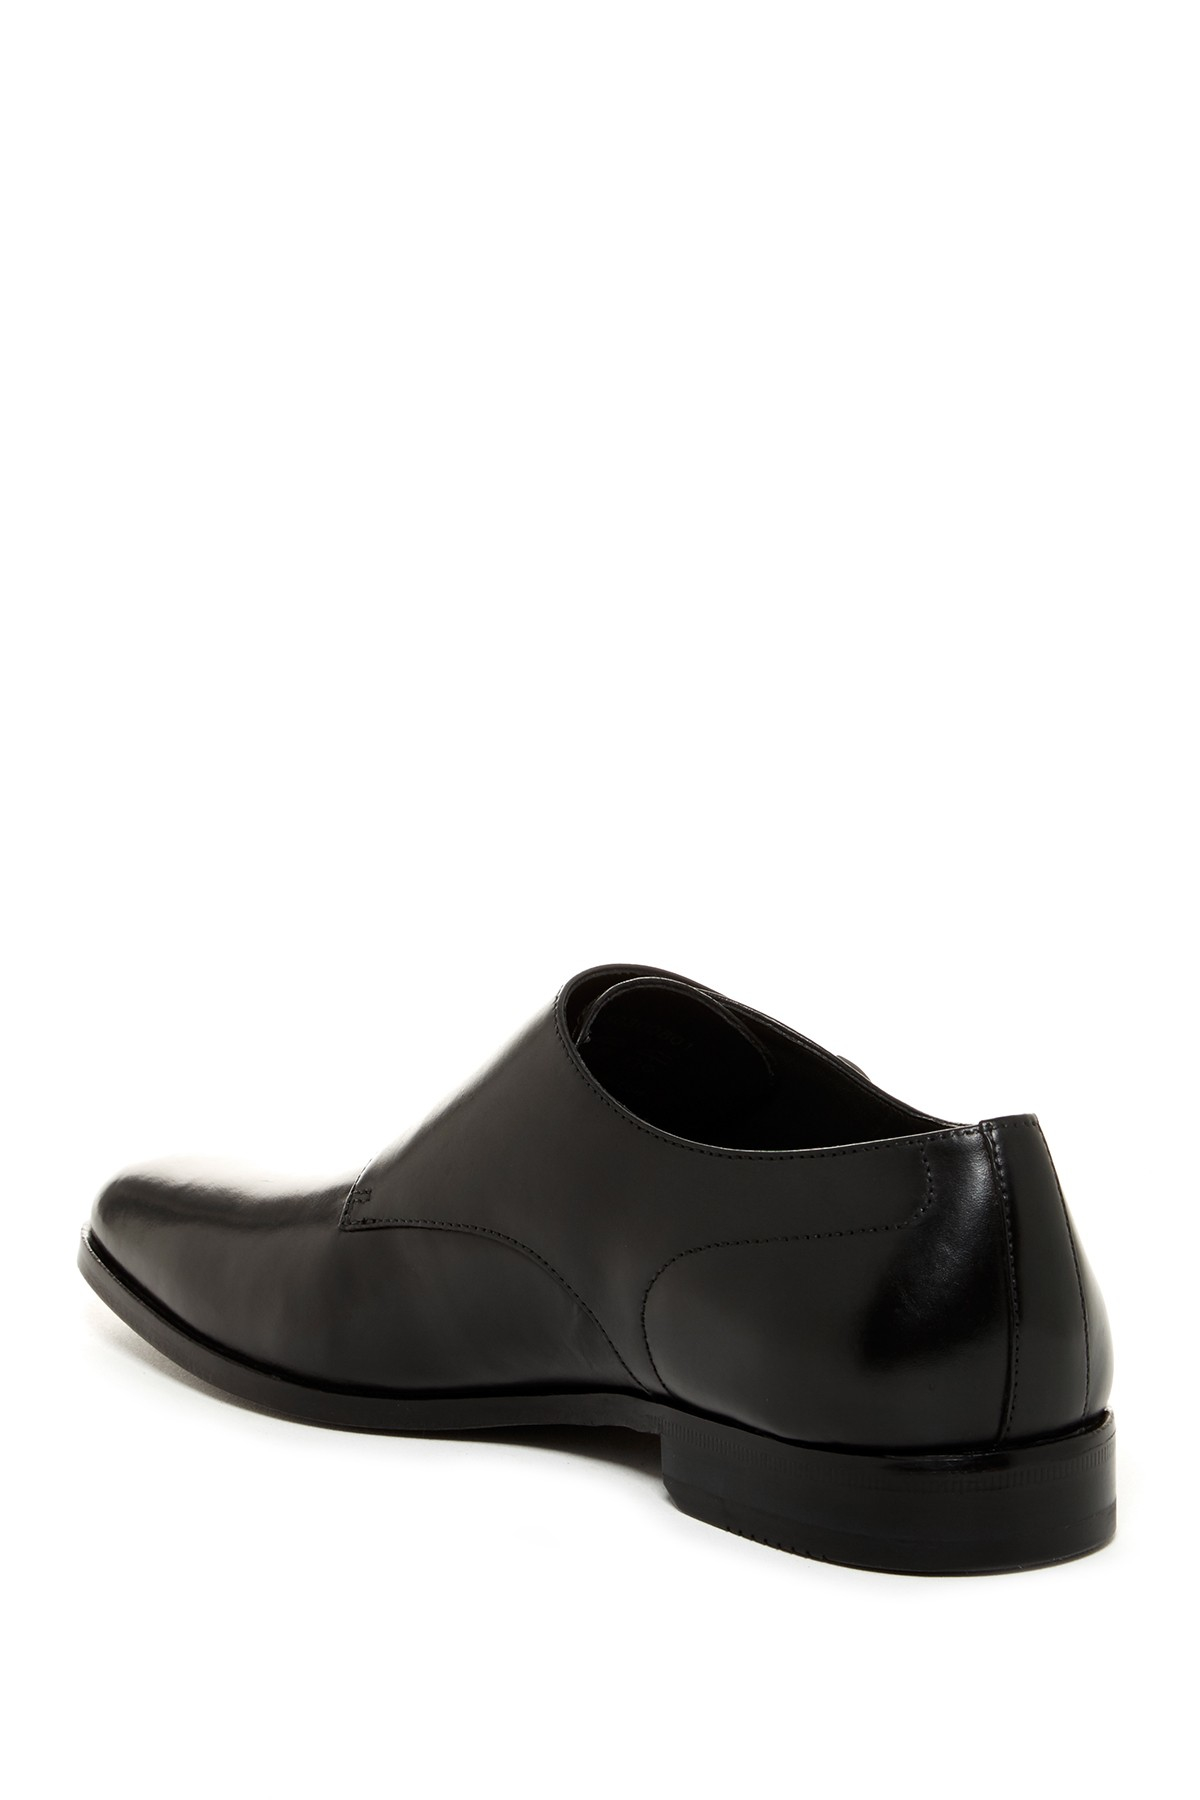 Bottega Veneta Shoe Sizing True For Men